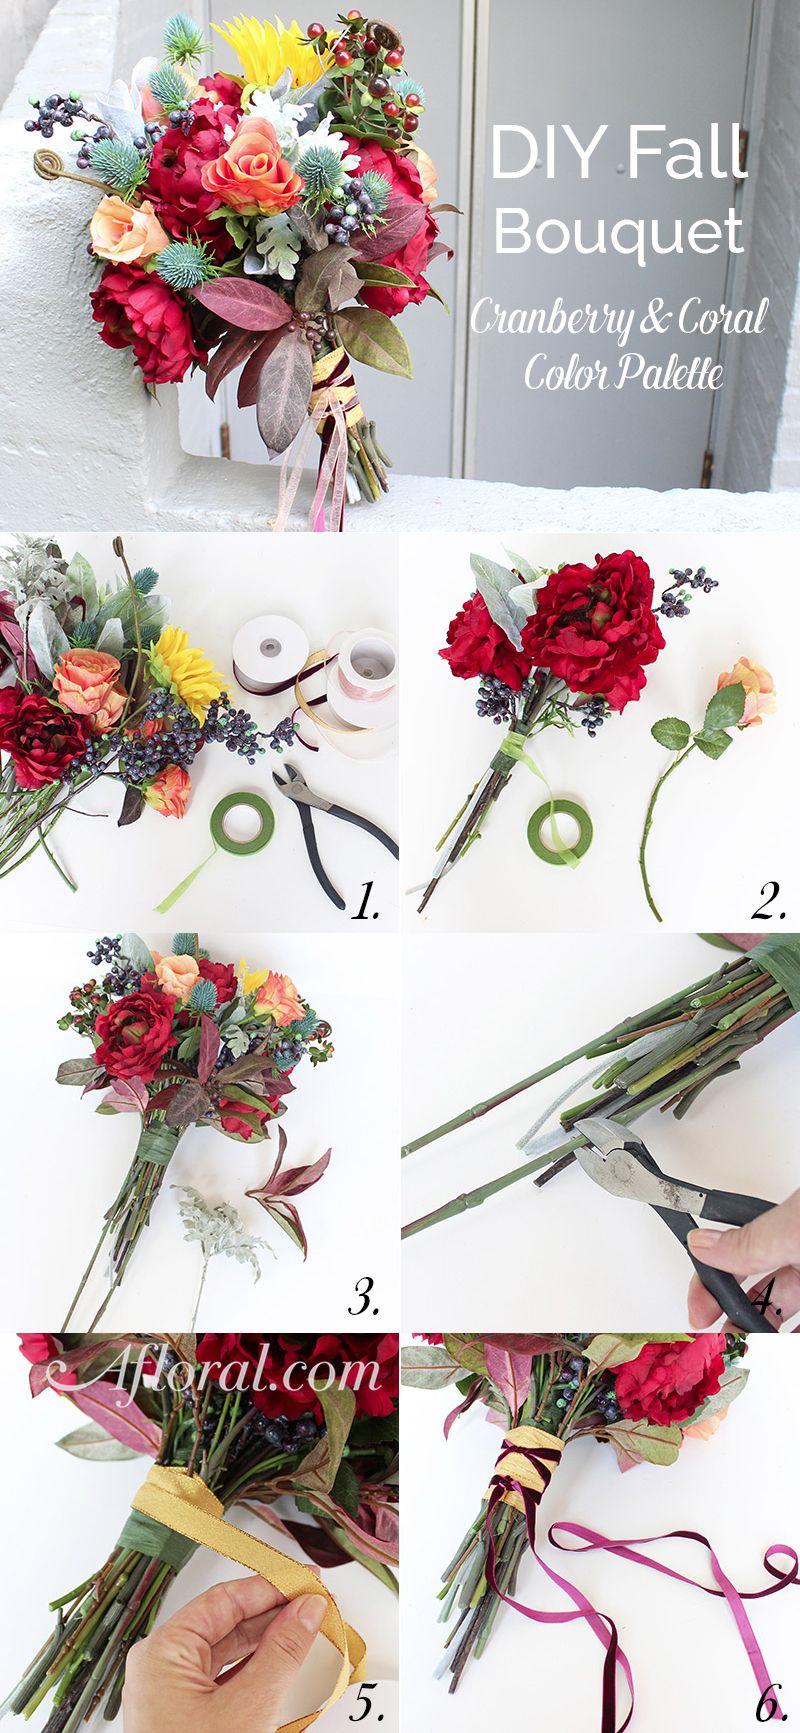 DIY Fall Bouquet Cranberry & Coral | Fall wedding flowers, Fall ...